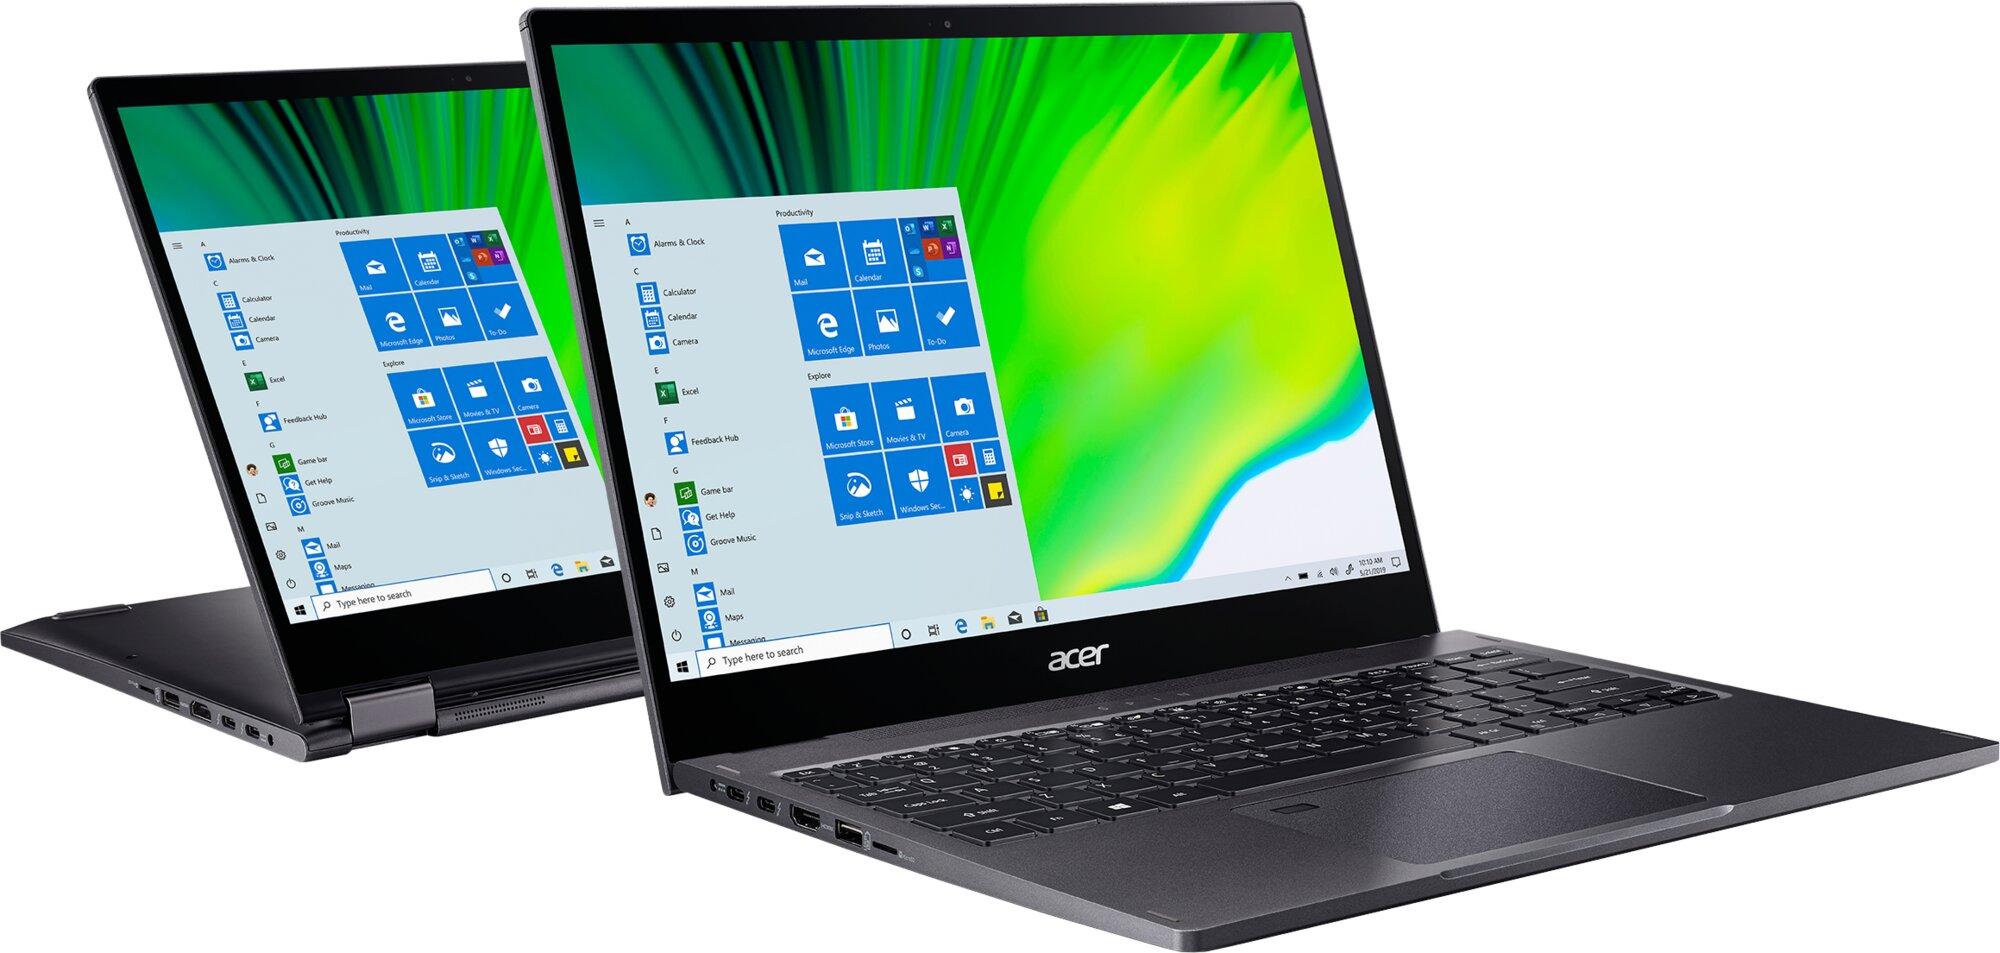 Acer Spin 5 SP513-54N-765T